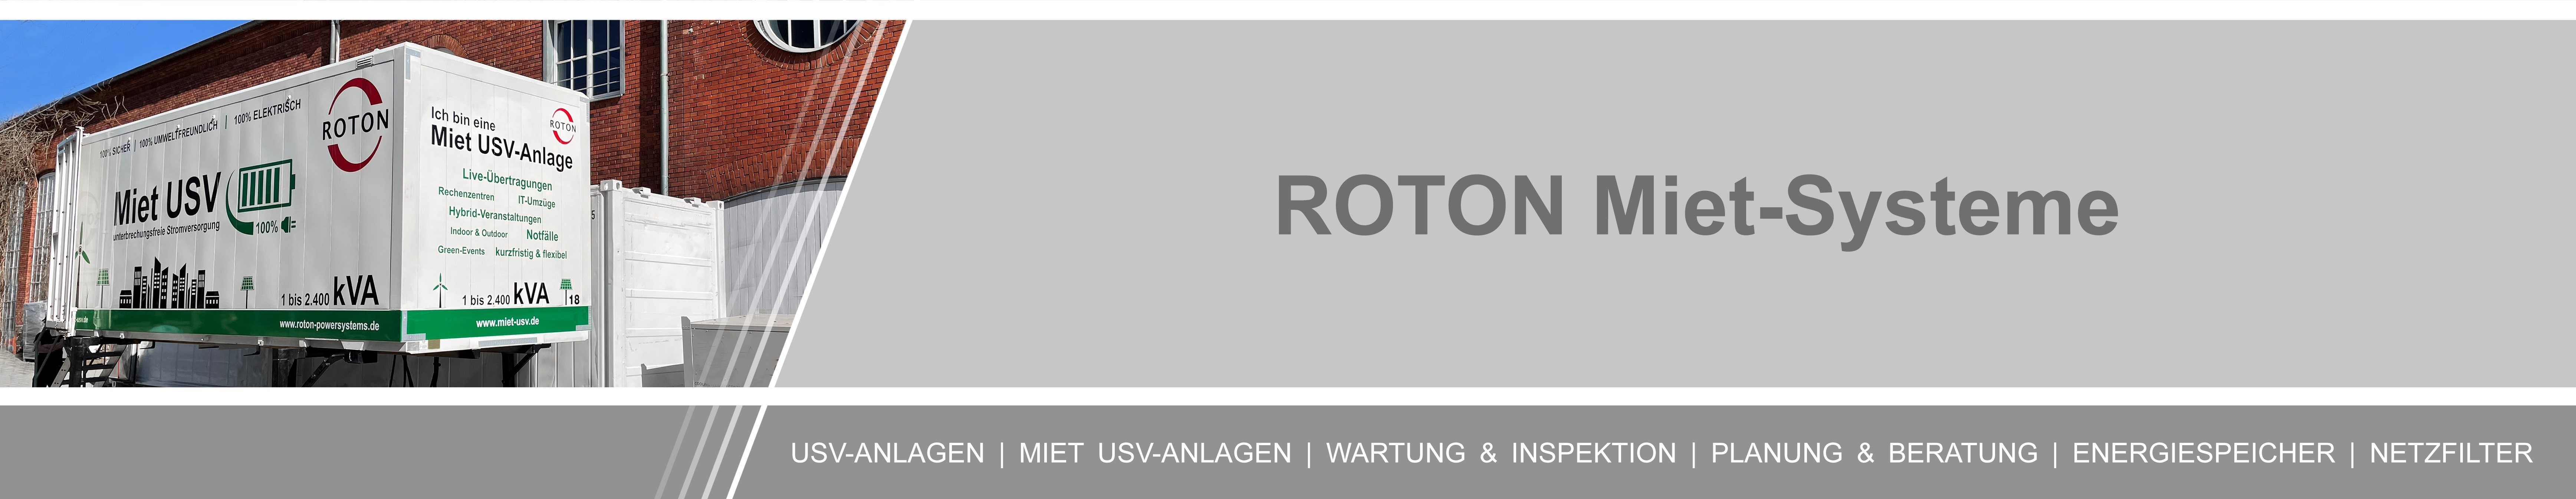 Miet-USV - ROTON PowerSystems GmbH